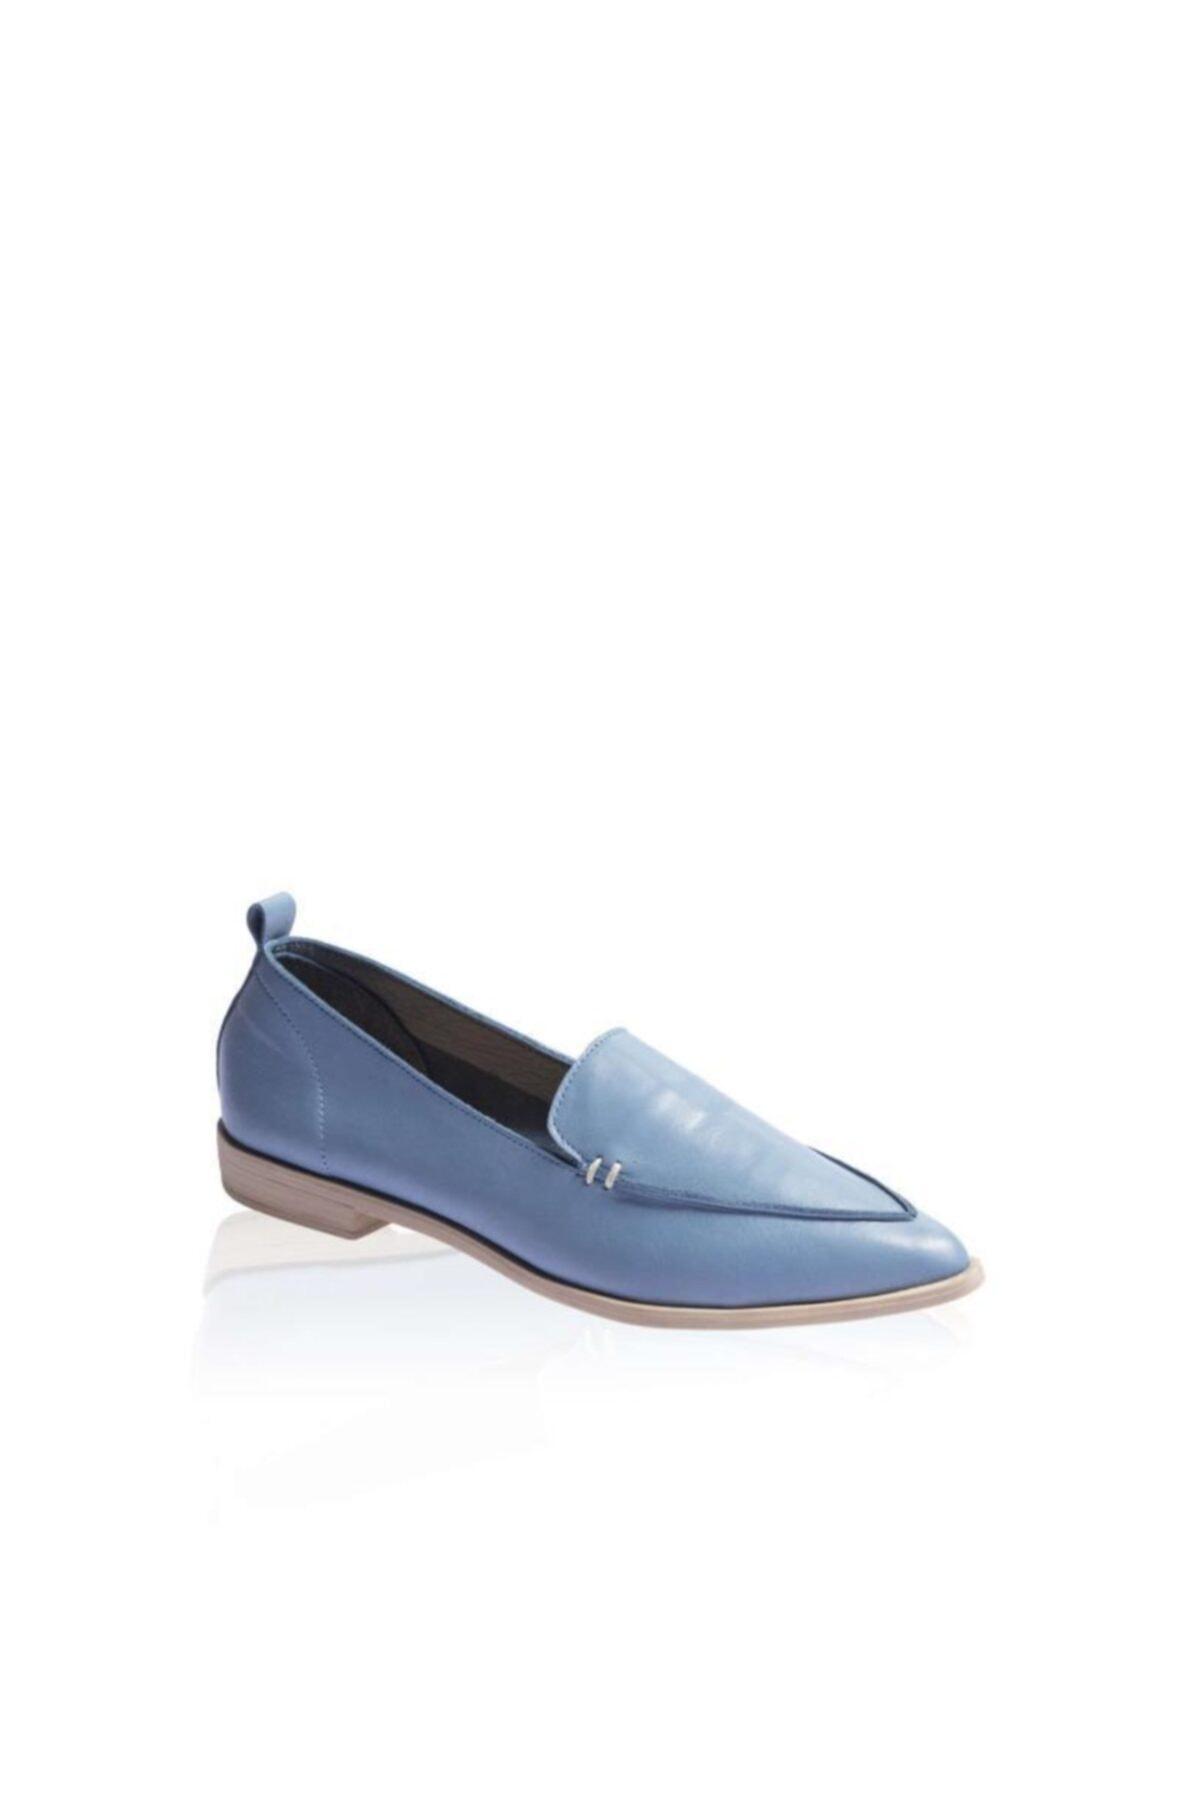 BUENO Shoes  Bayan Ayakkabı 9n0128 2